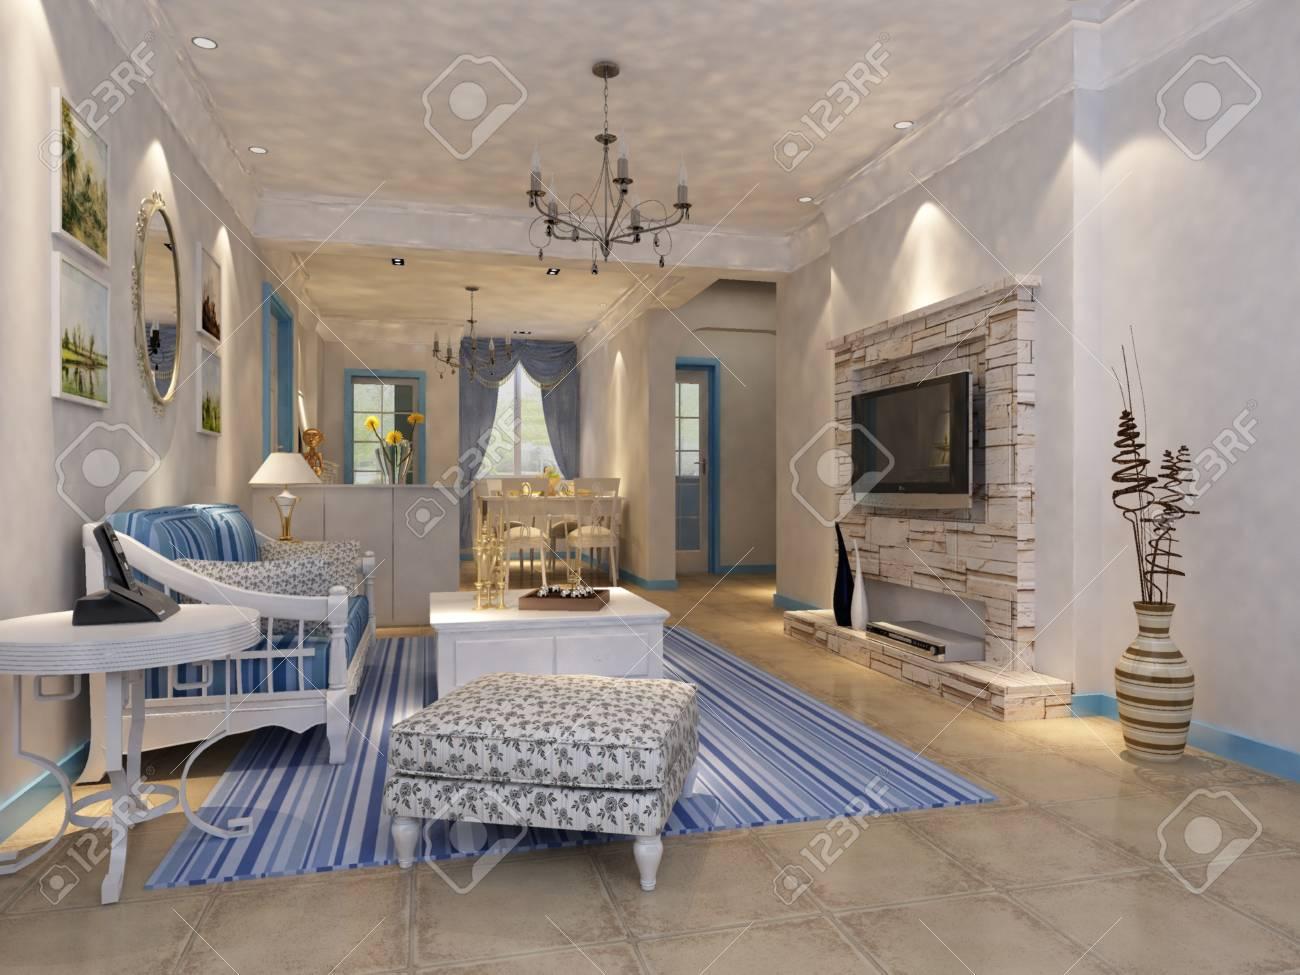 Interior fashionable living-room rendering Stock Photo - 9318405